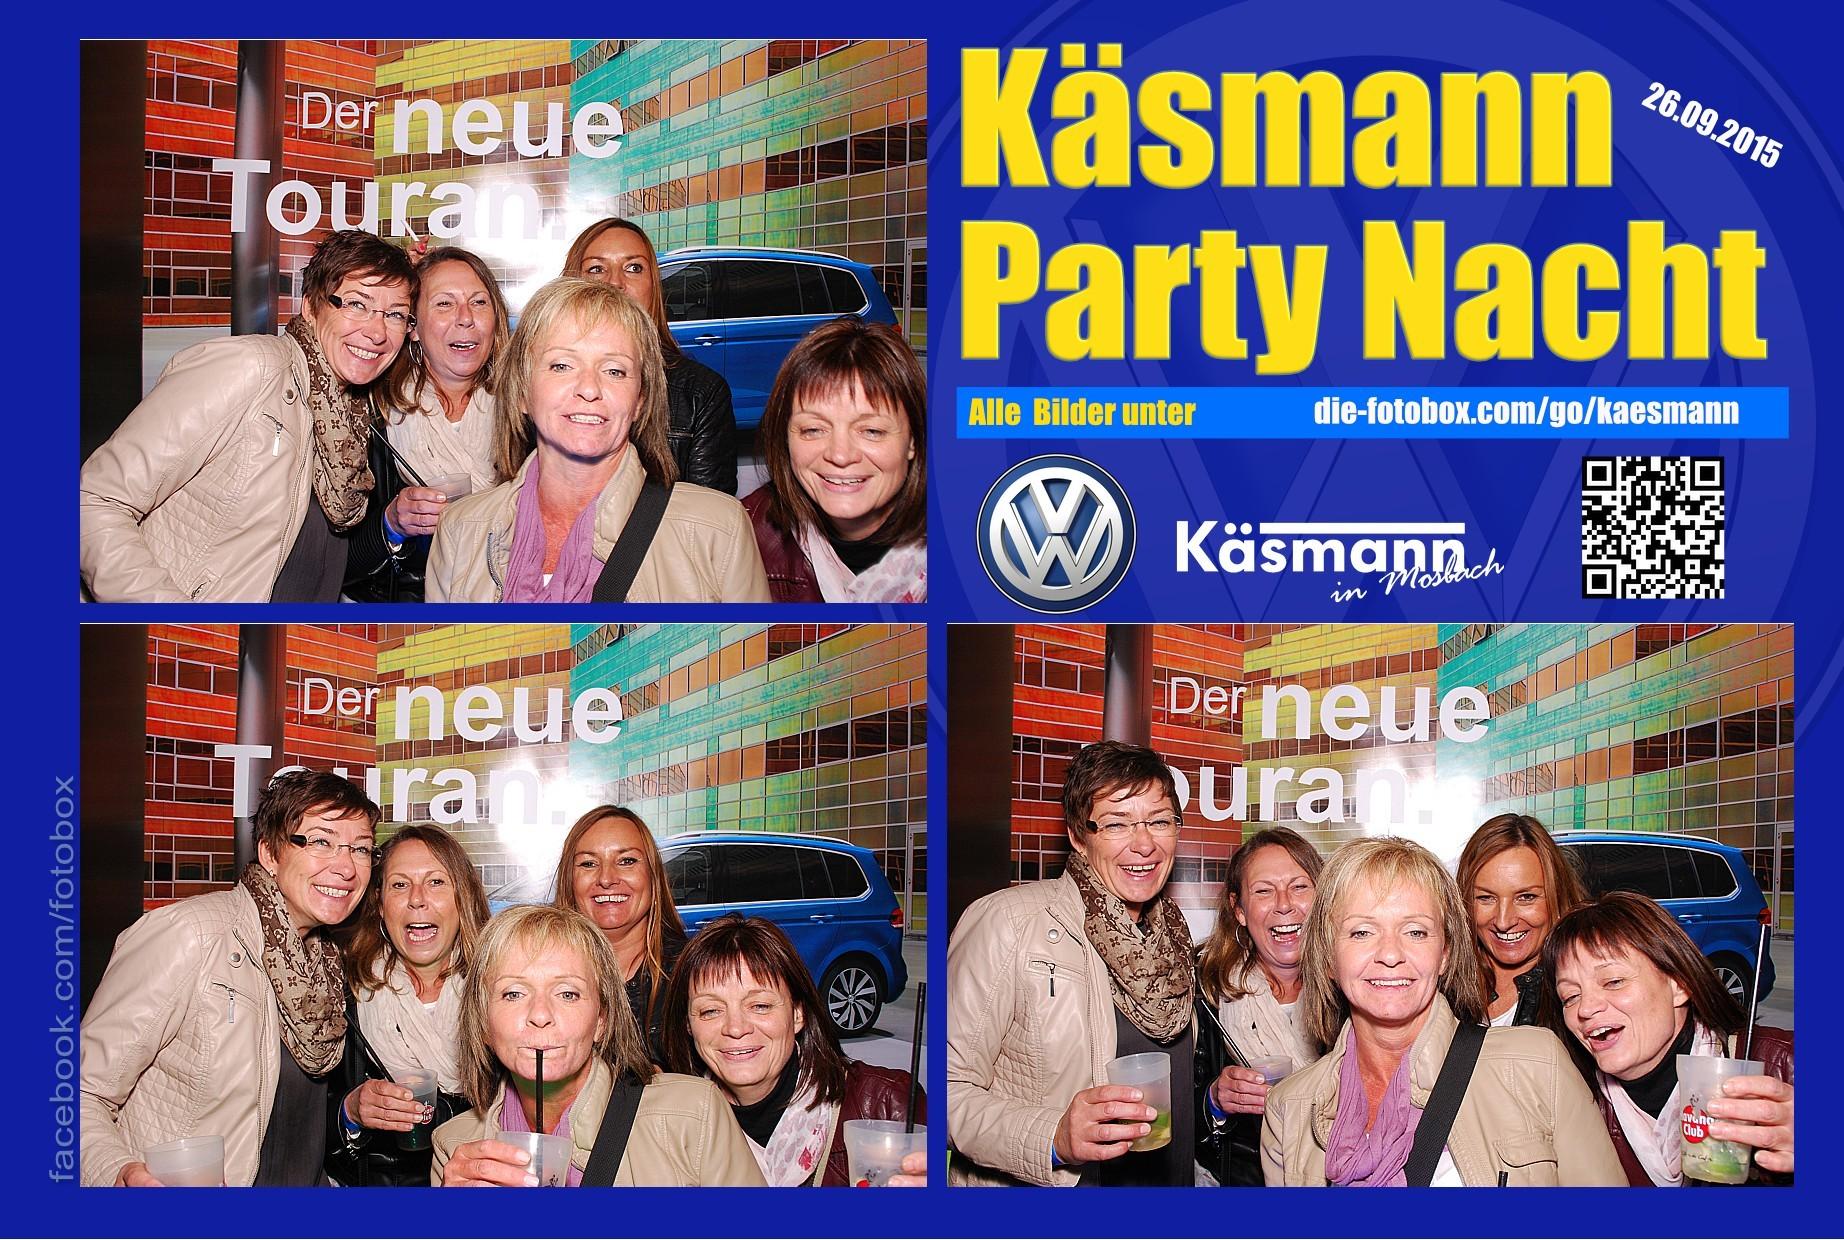 Käsmannparty 2015 - www.die-fotobox.com 01128